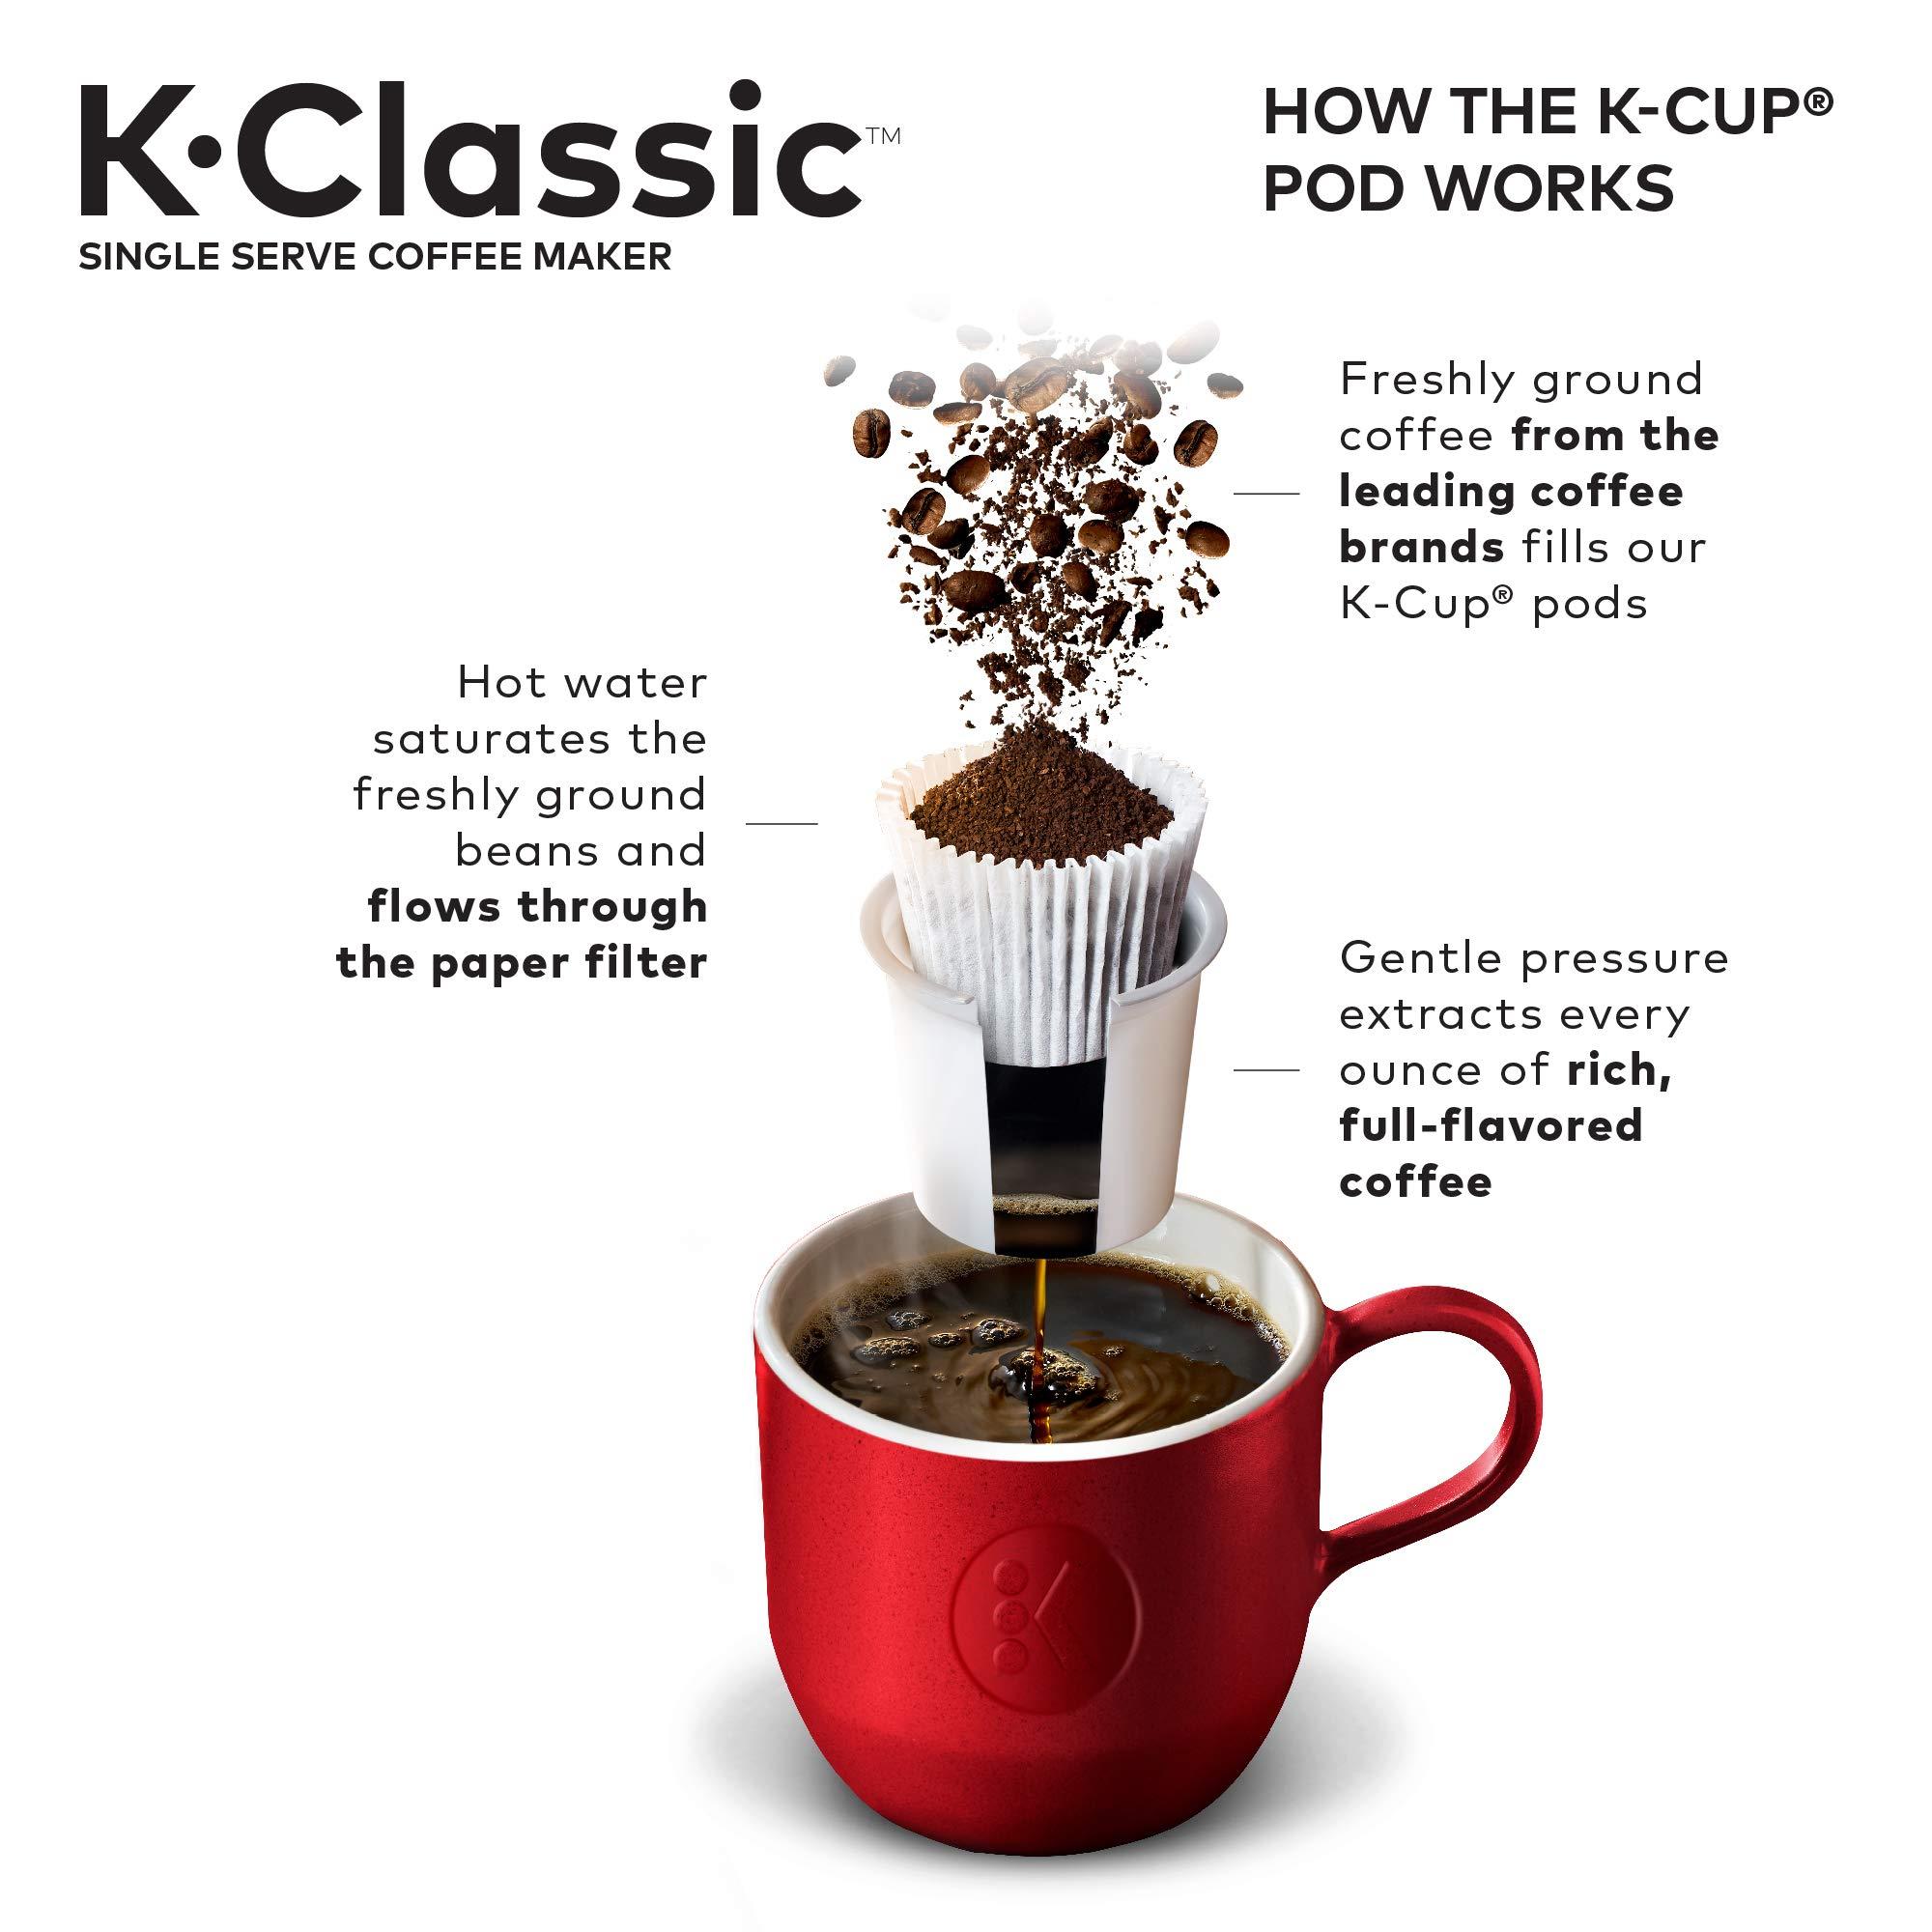 Keurig K-Classic Coffee Maker, K-Cup Pod, Single Serve, Programmable, White by Keurig (Image #5)